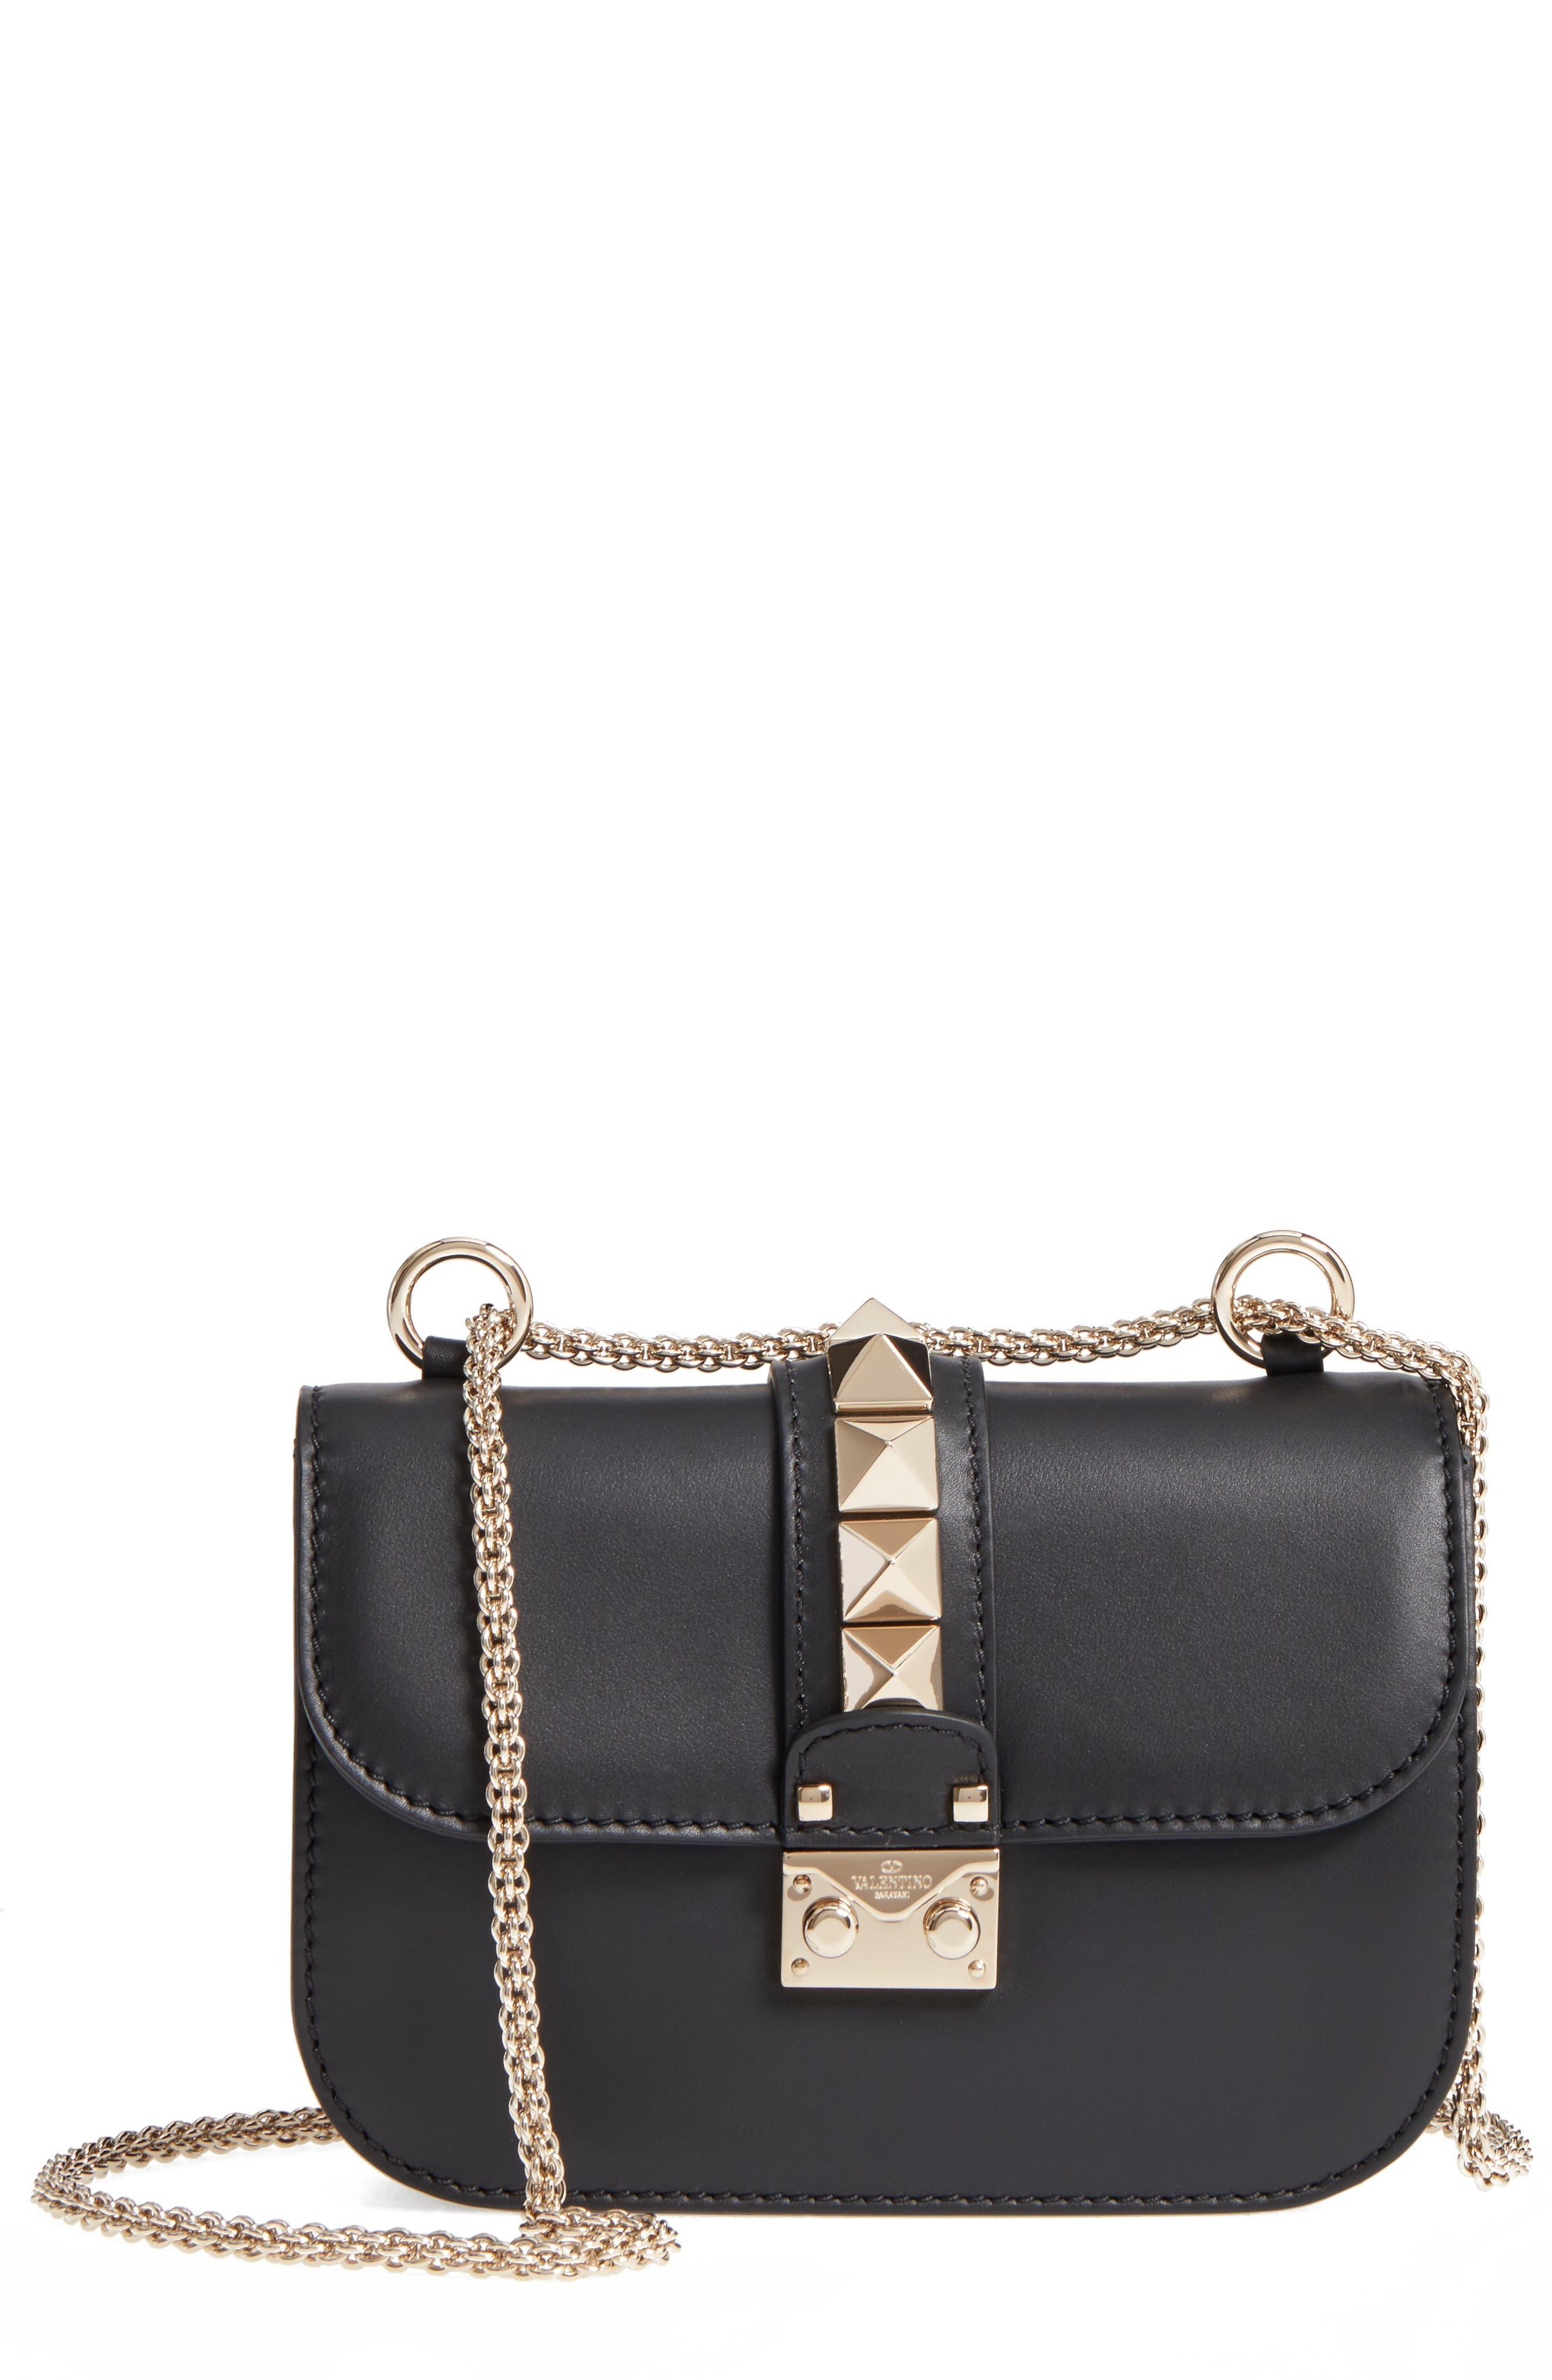 Small Lock Leather Crossbody Bag,                             Main thumbnail 1, color,                             Nero